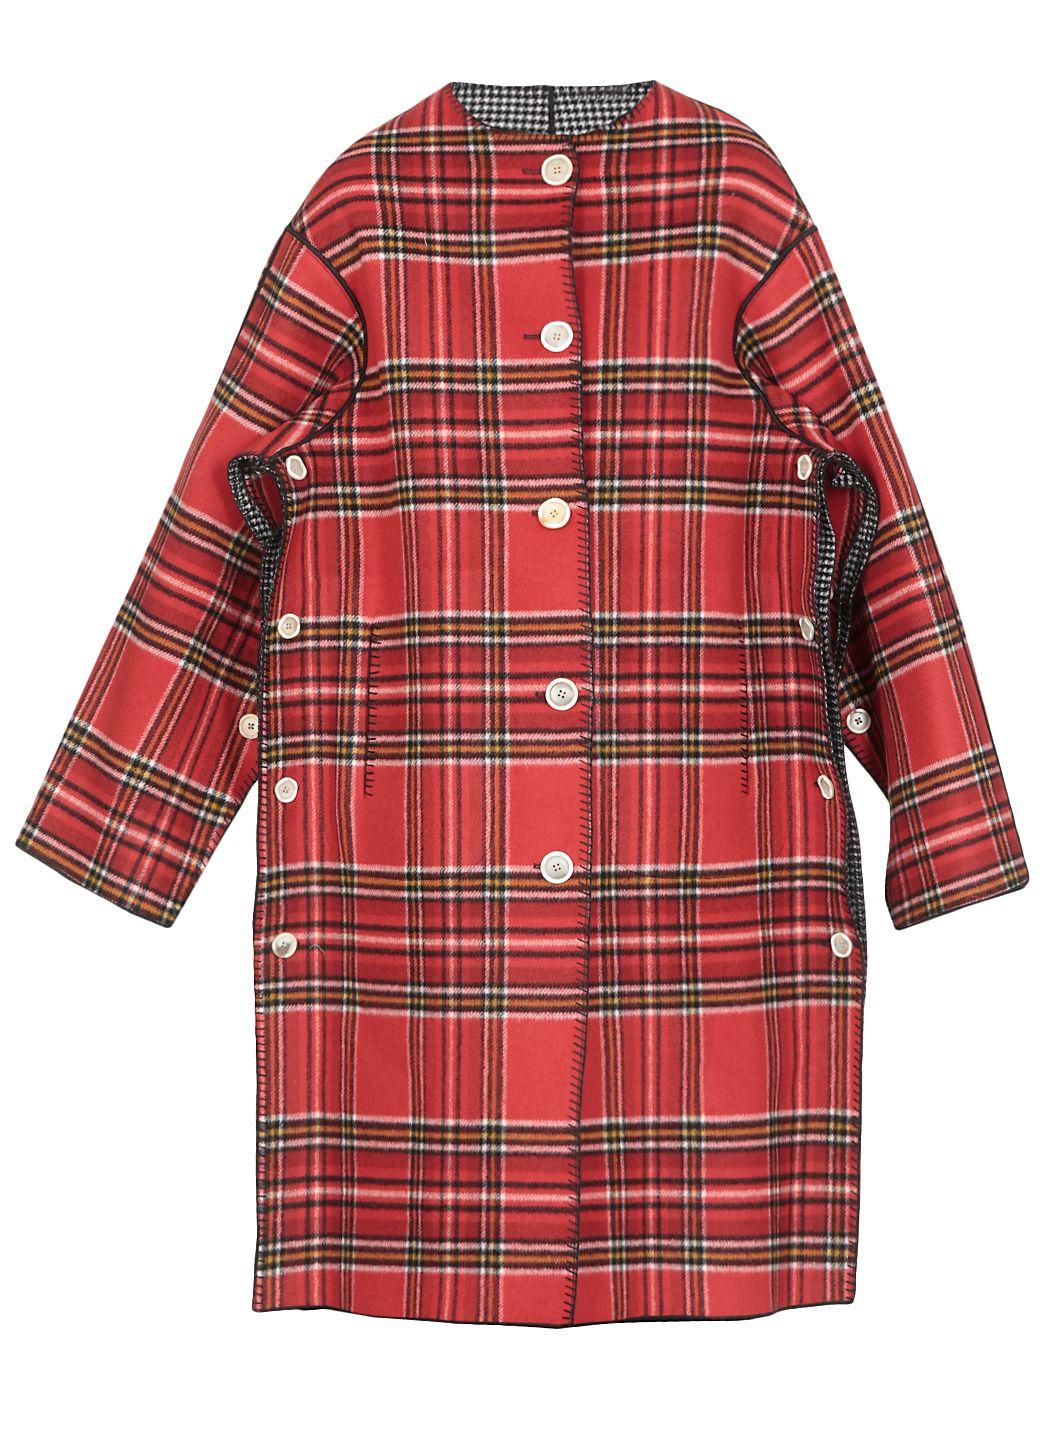 Double face melton wool coat